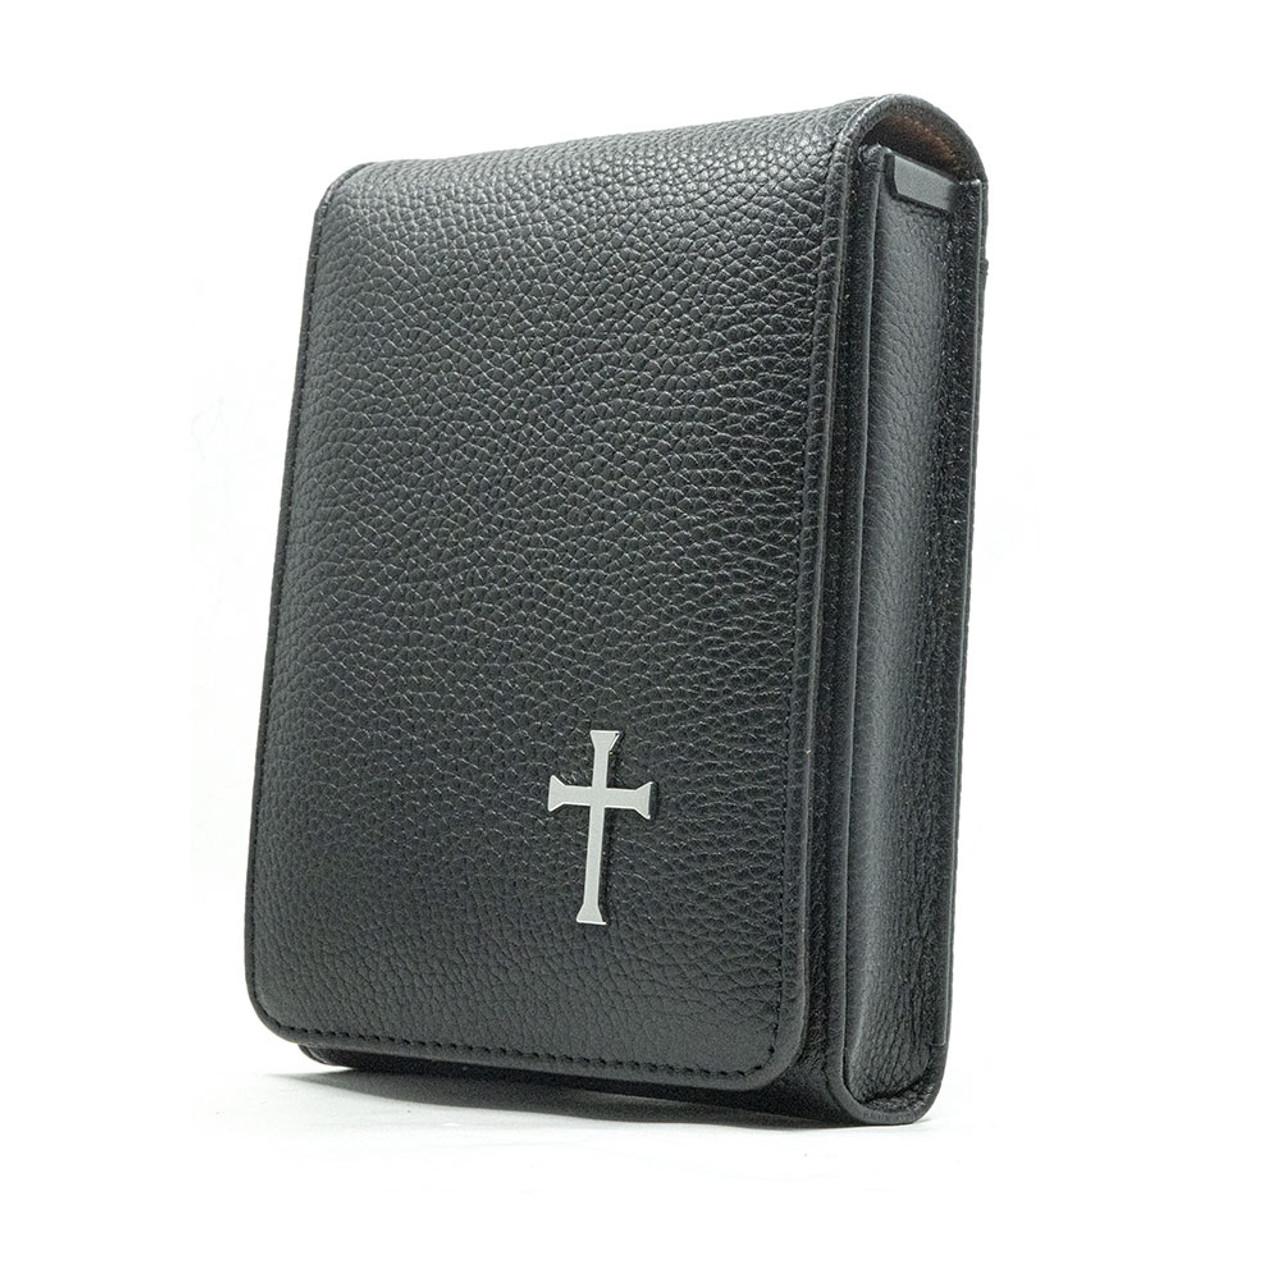 Taurus G3 Black Leather Cross Series Holster